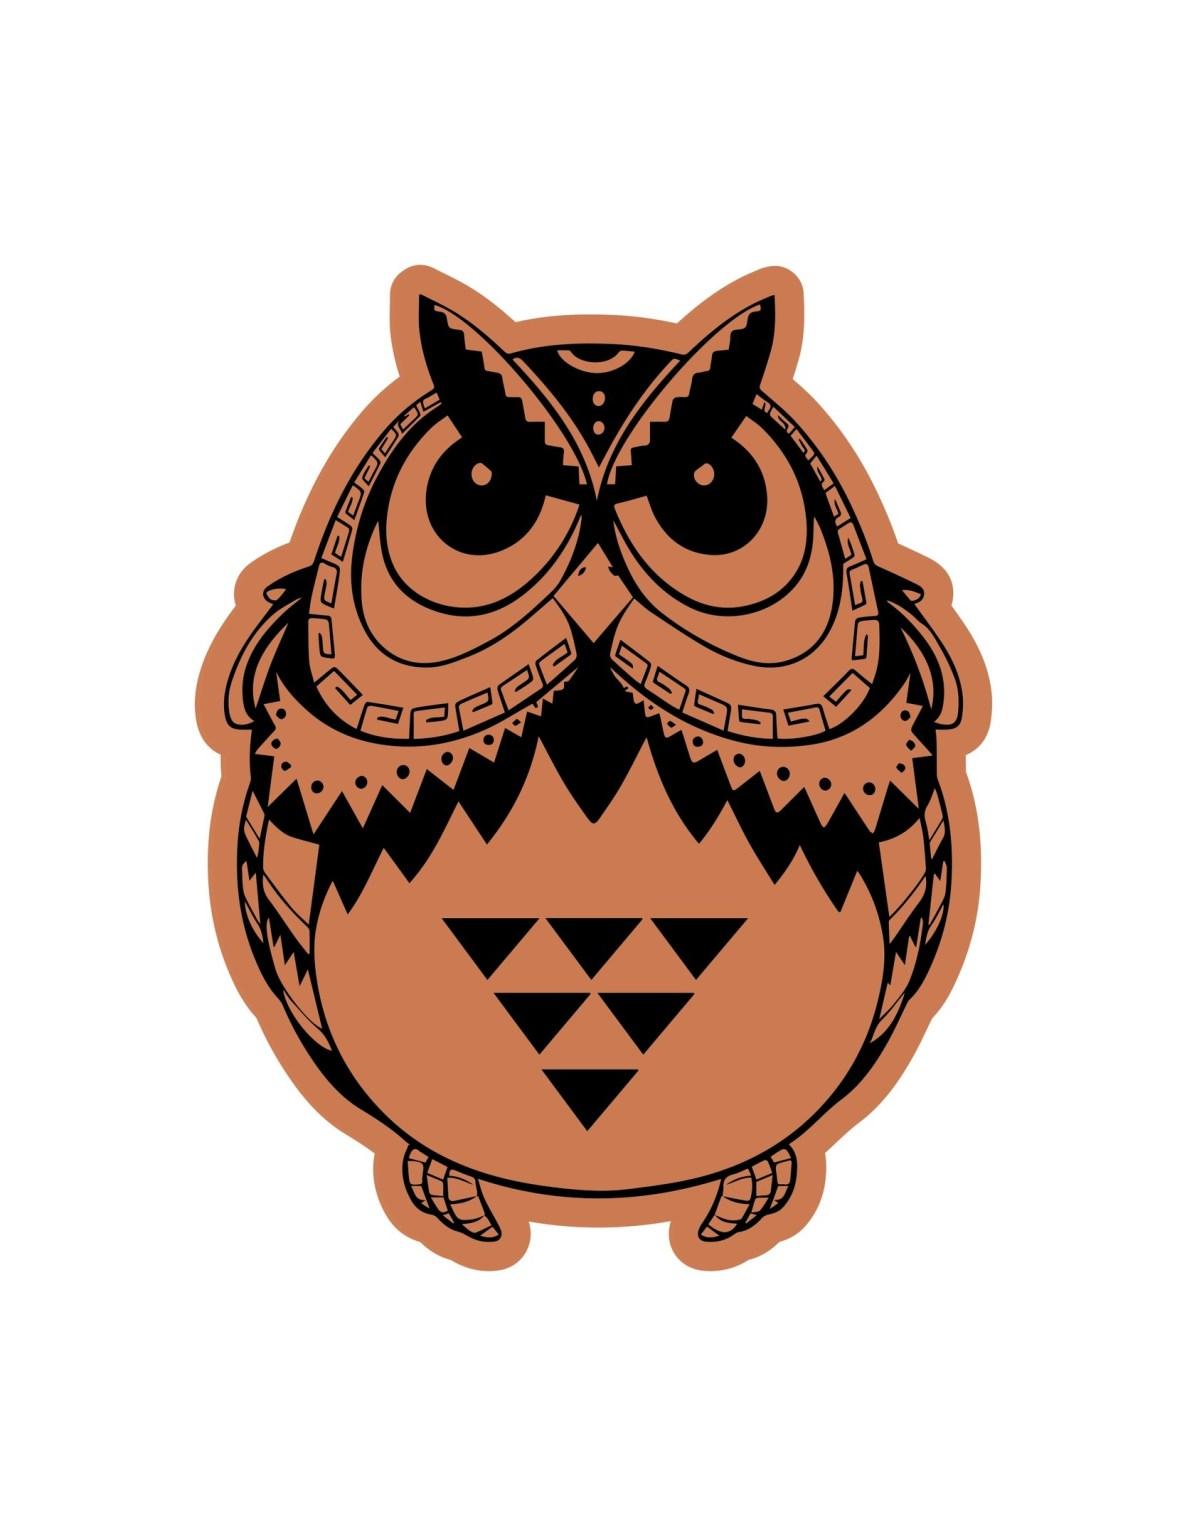 Owl Sitting Laser Cut Engraving Template Free CDR Vectors Art